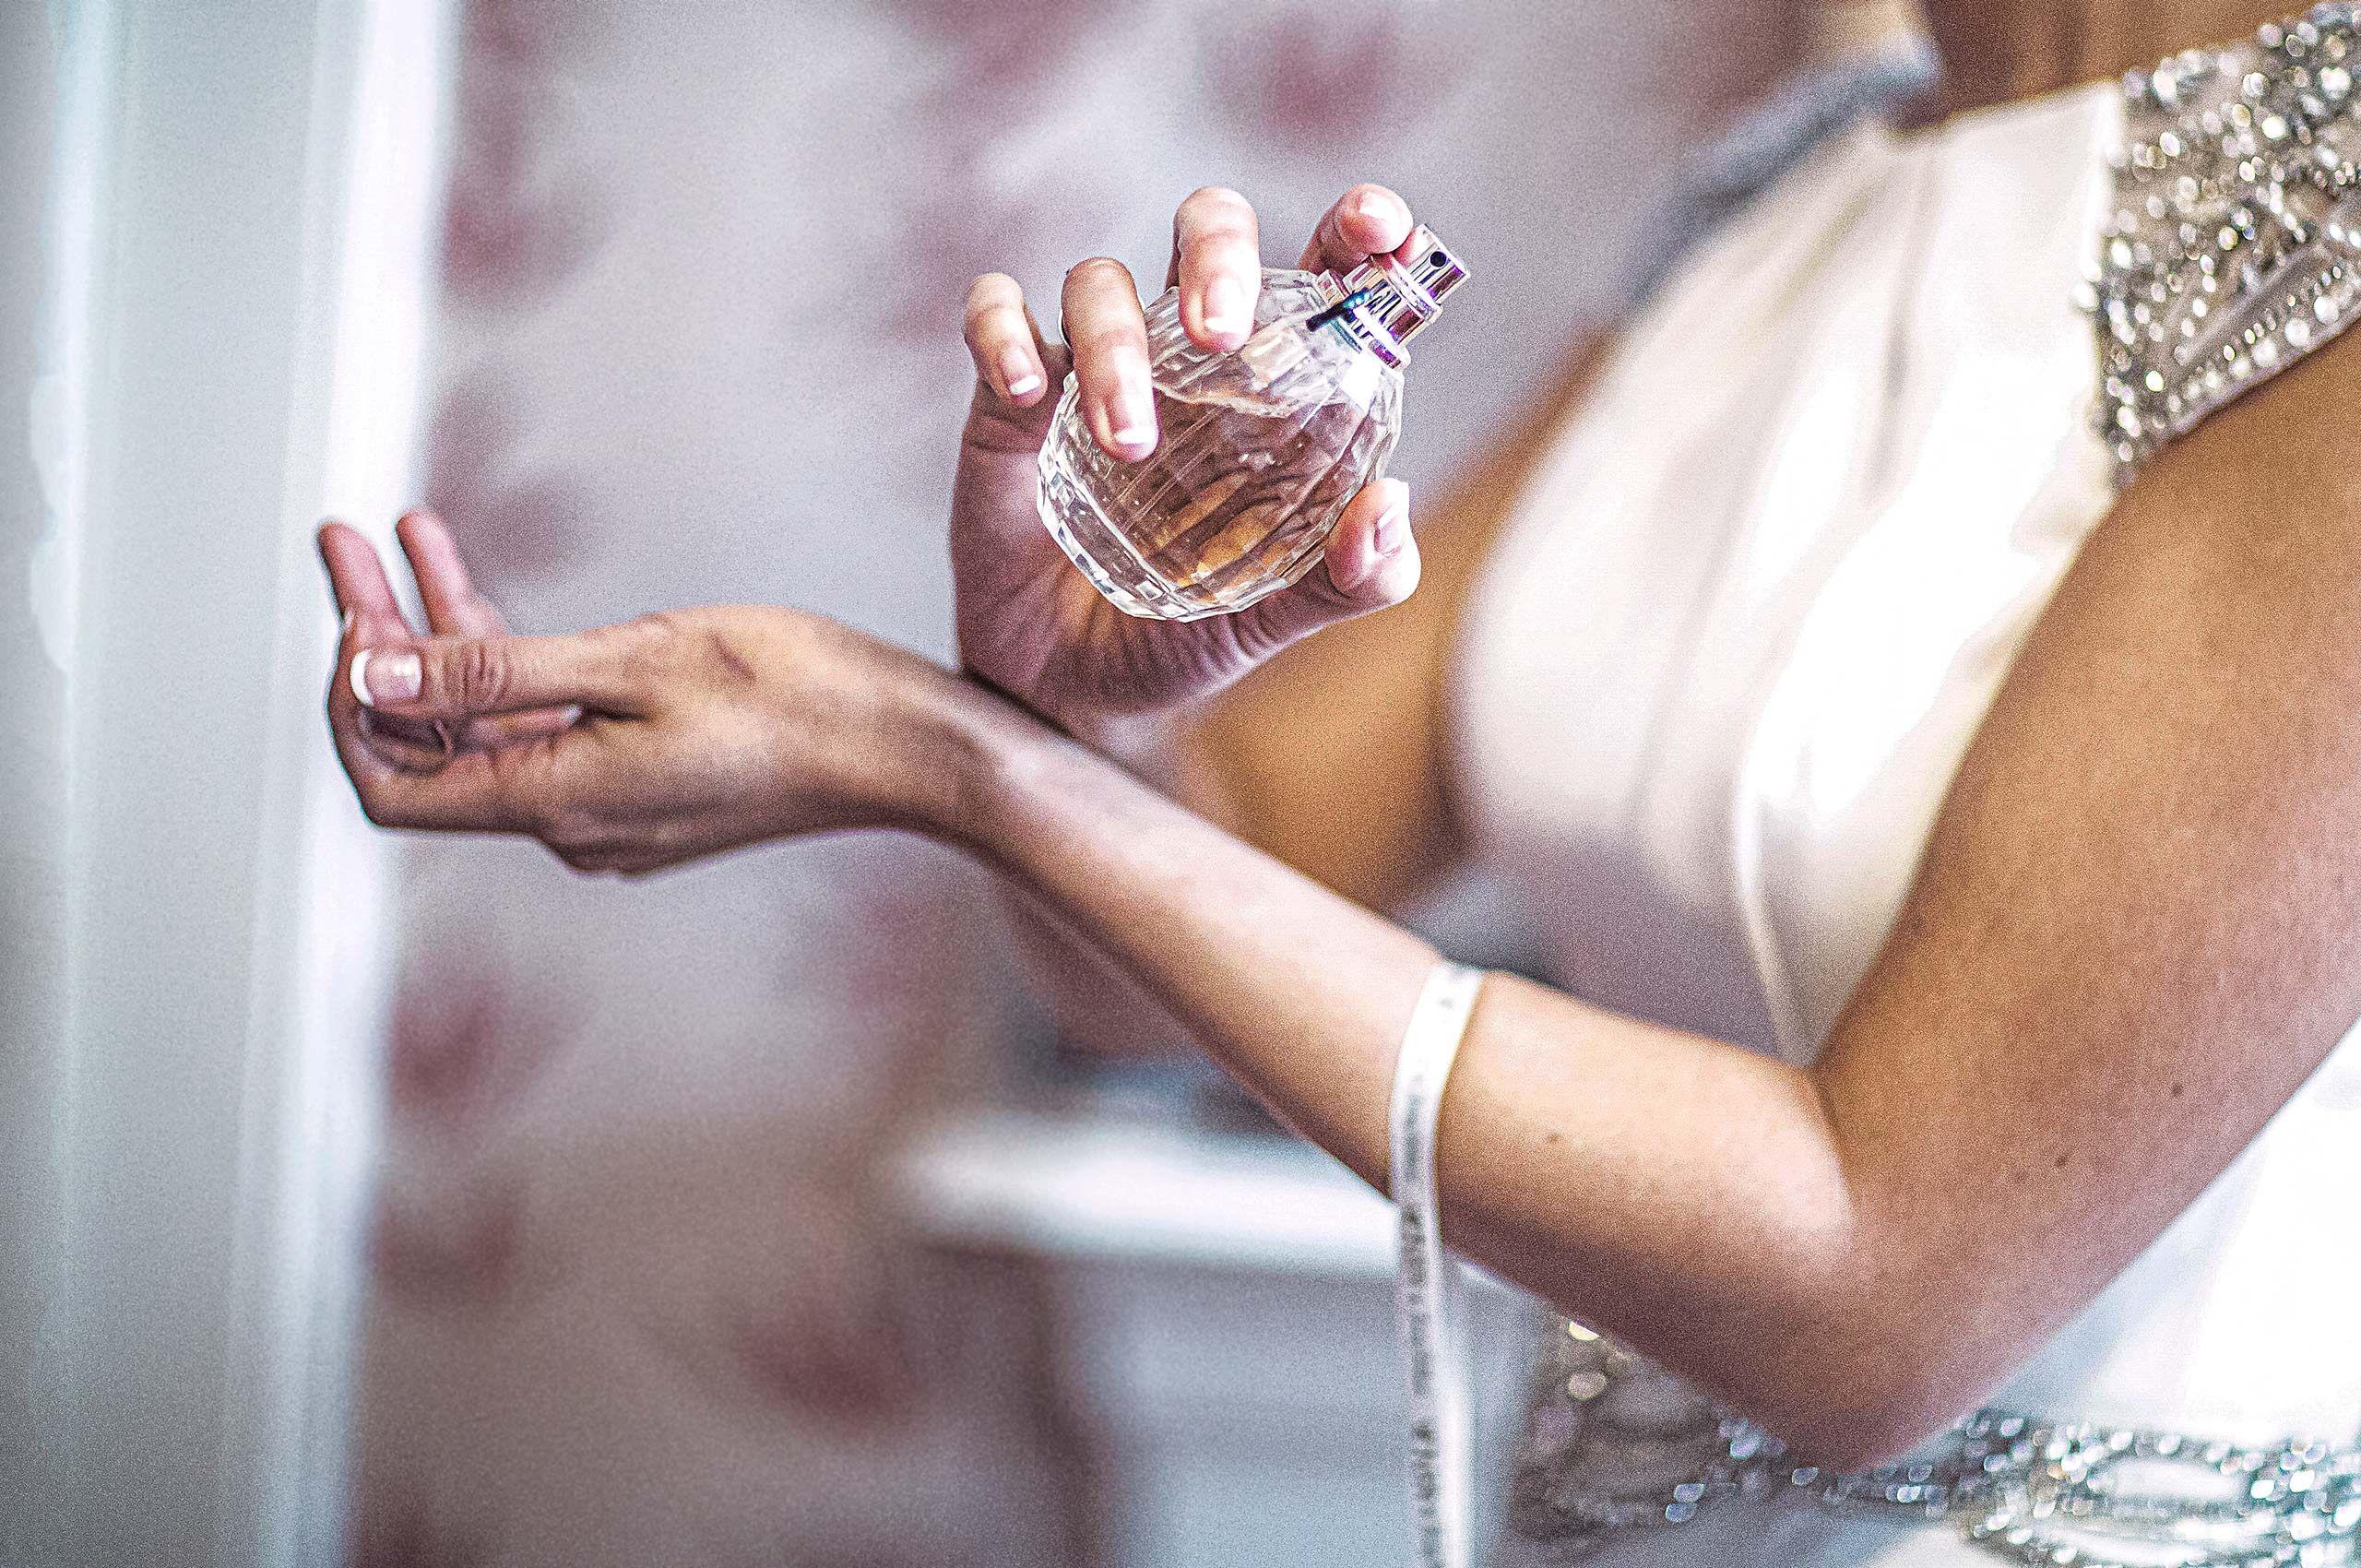 Paul-Hames-Wedding-Photography_Jody_Bridal-Prep.jpg